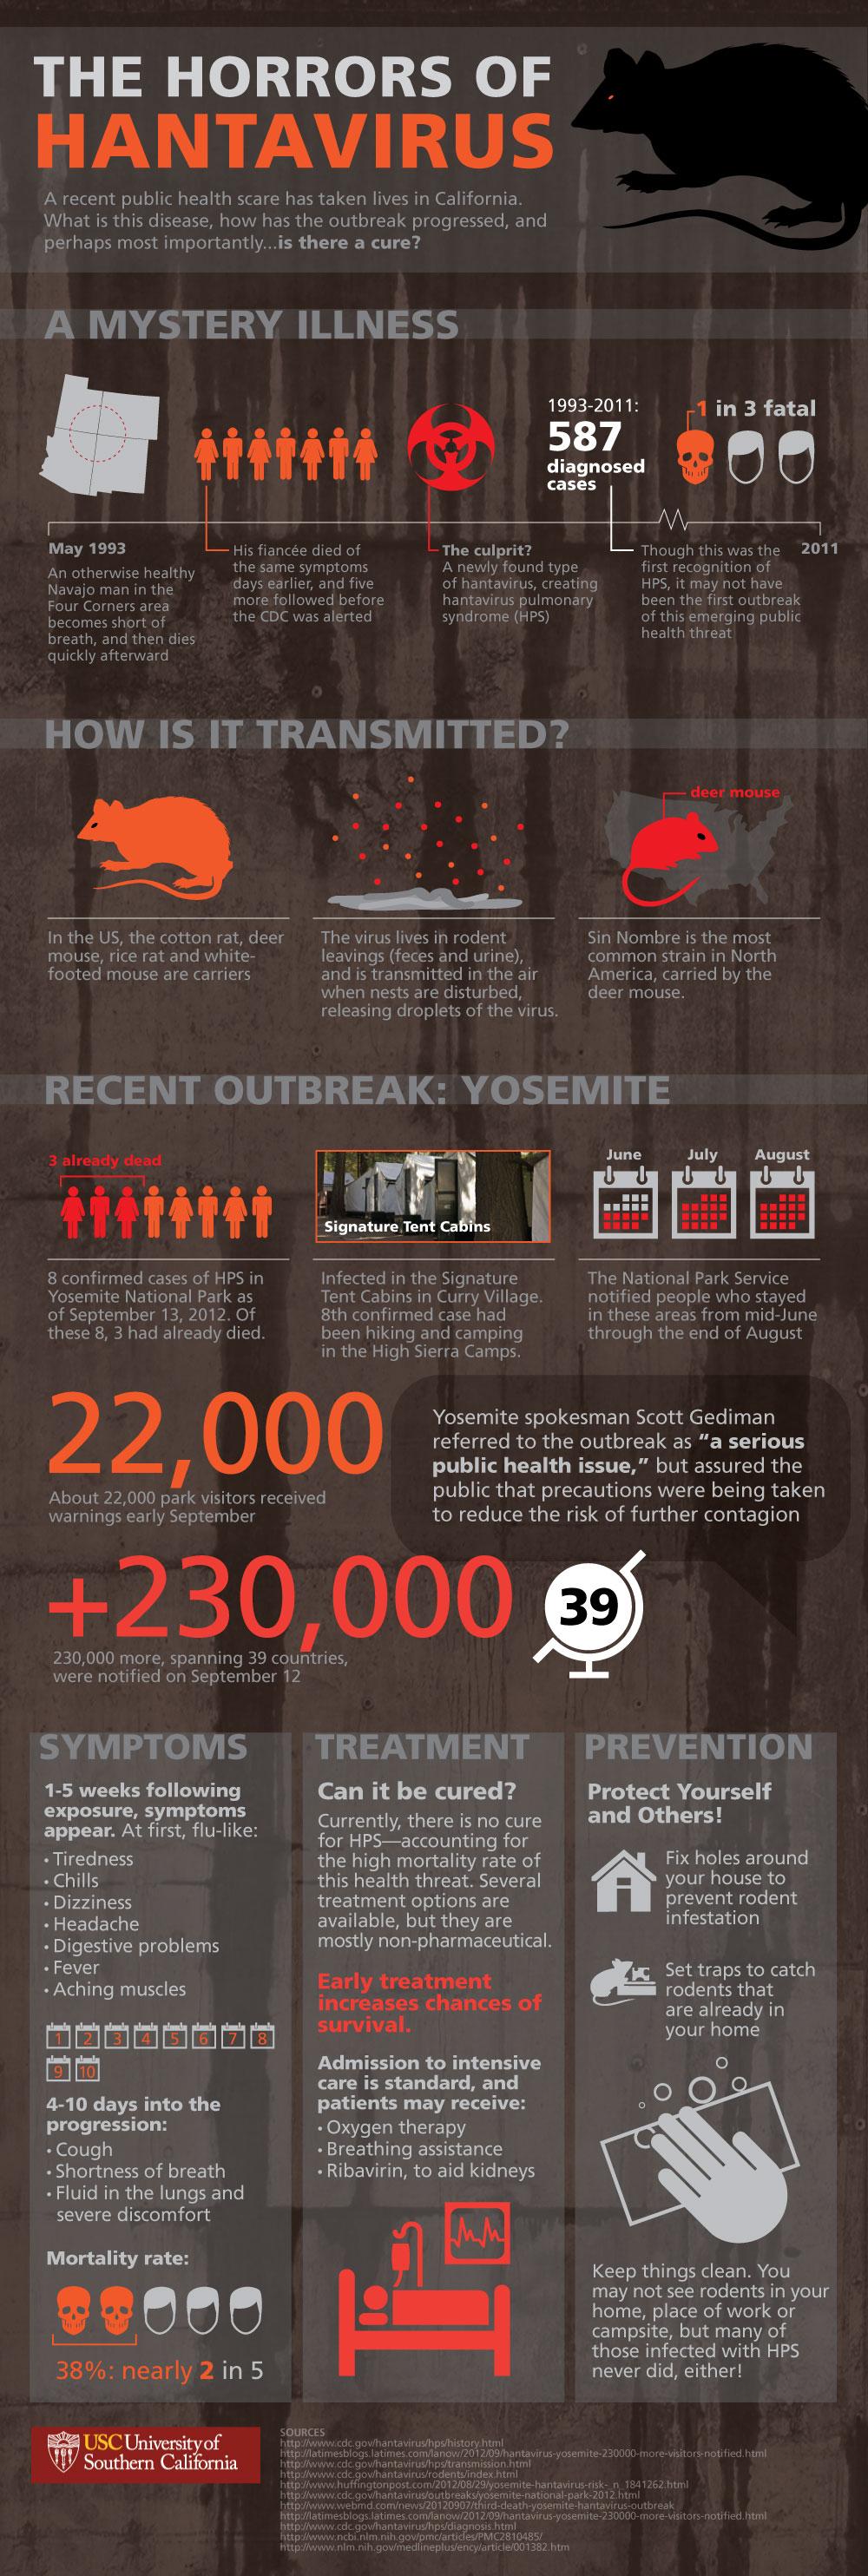 Hantavirus Infographic by USC